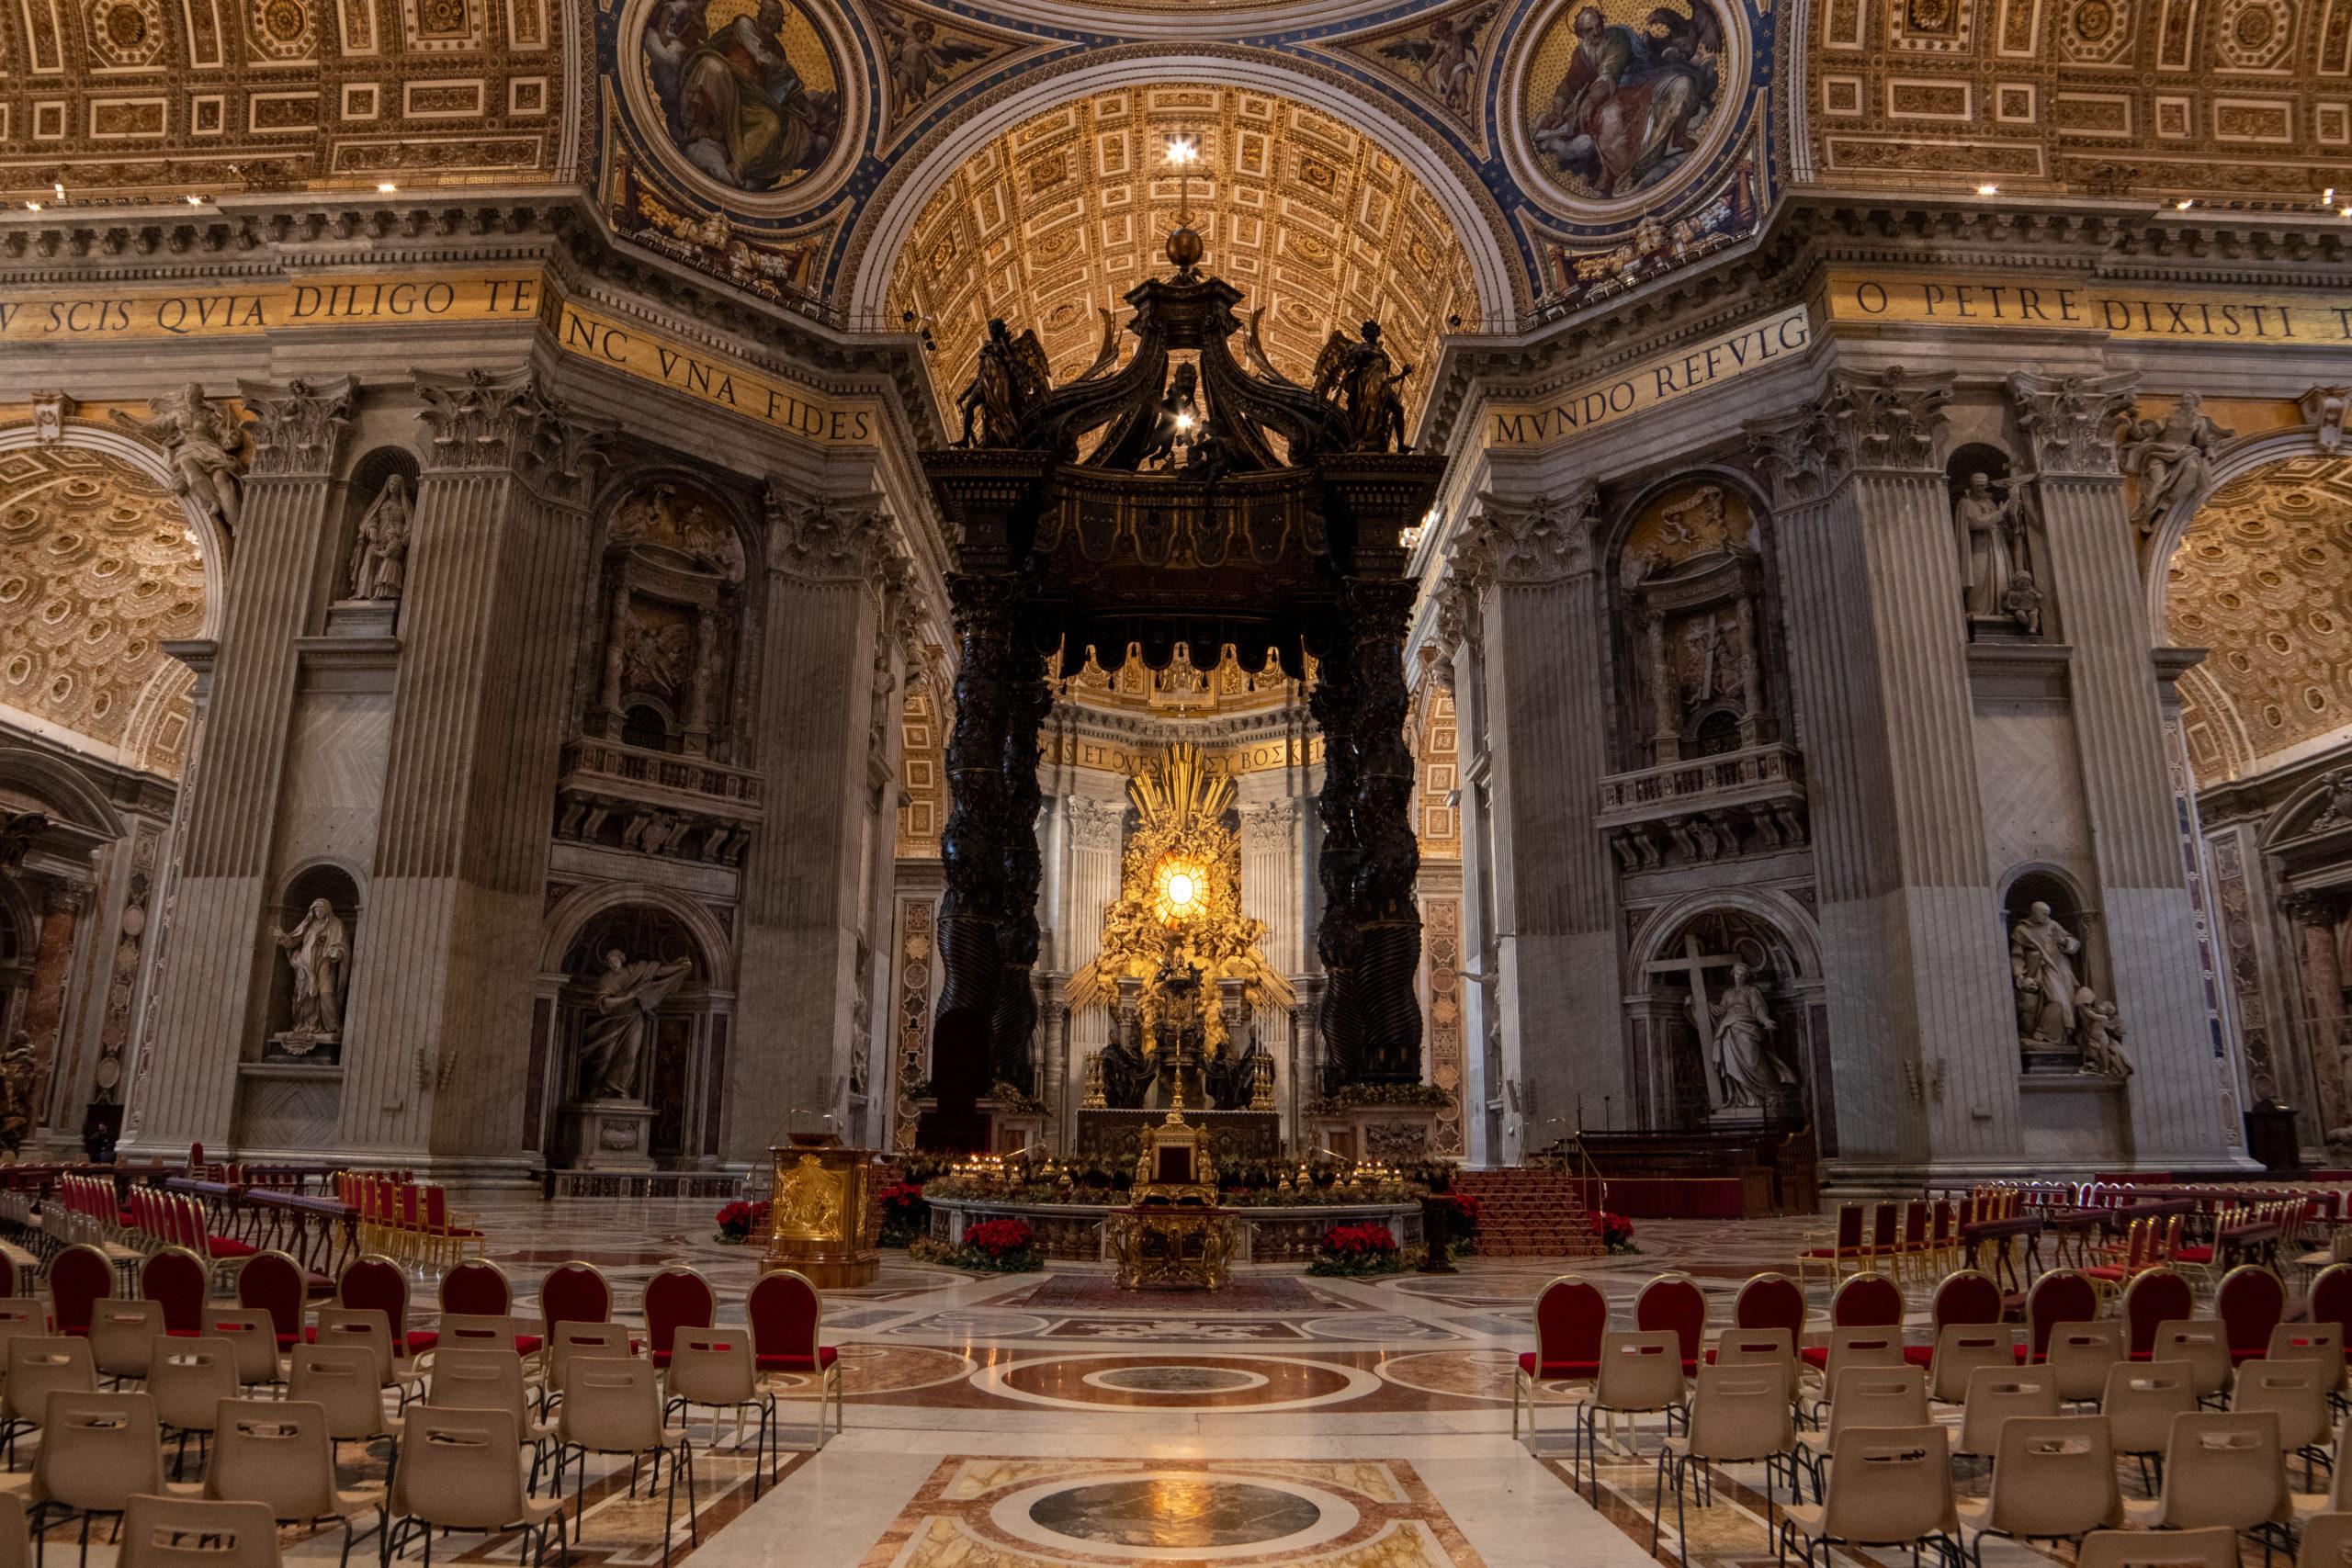 Altar of Saint Peter, by John Monarch